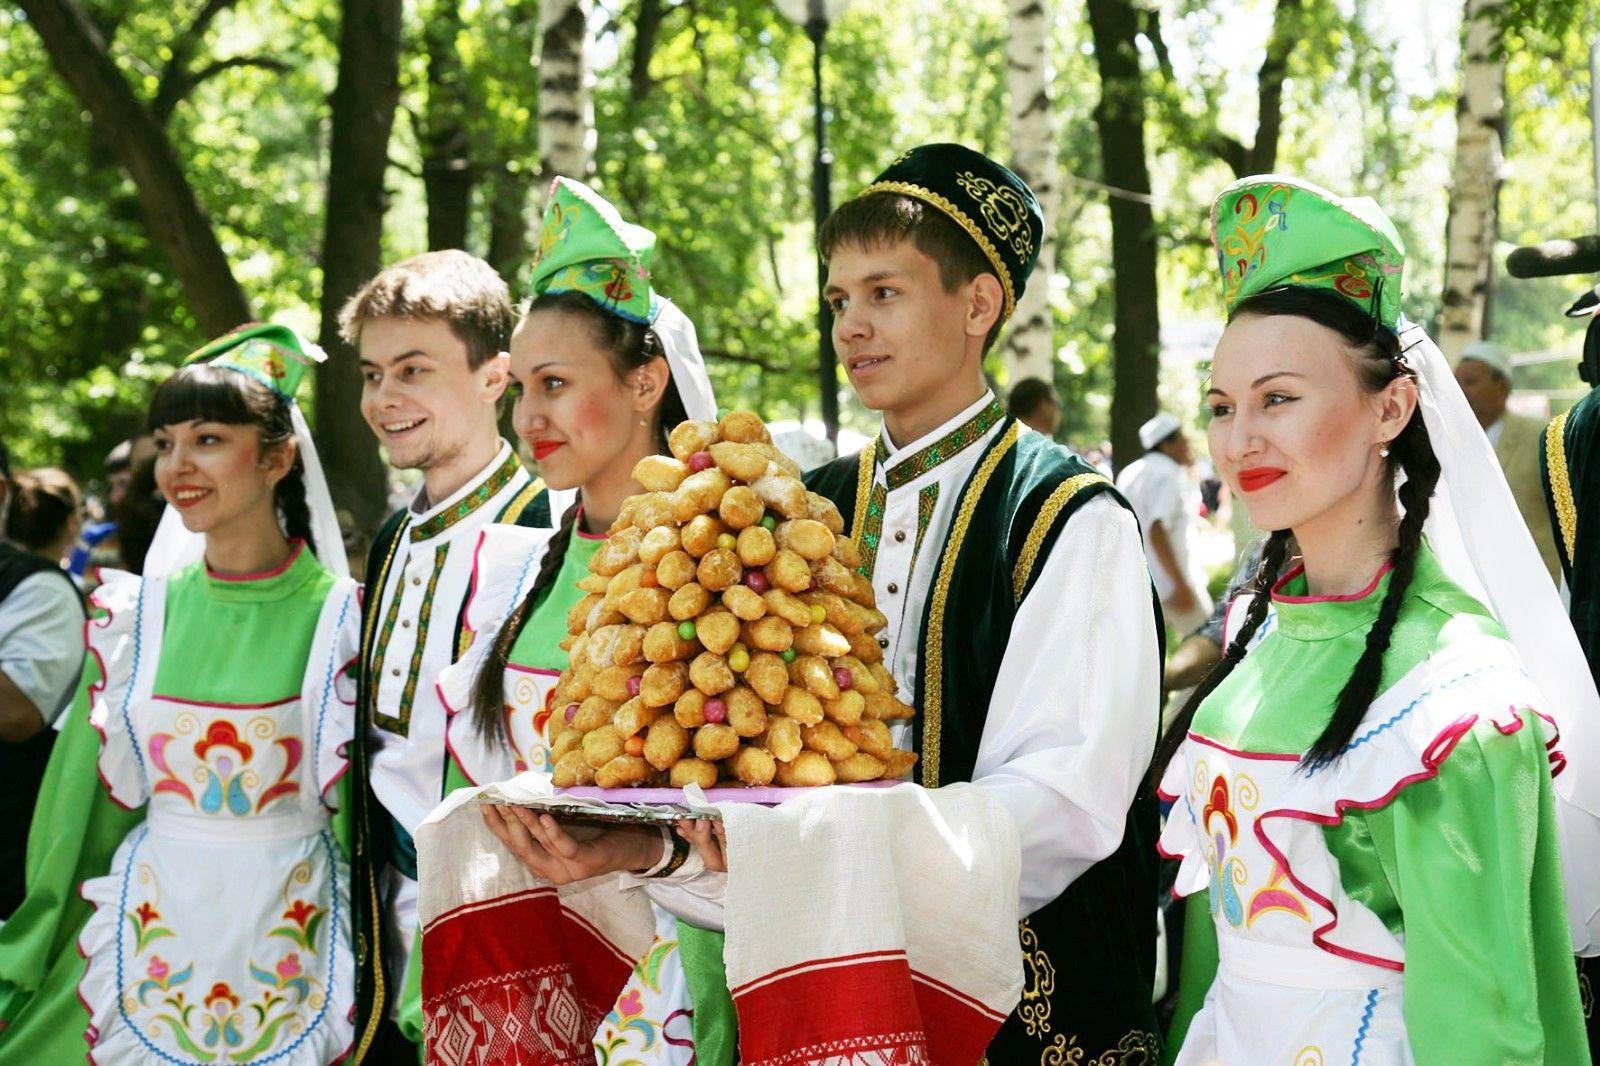 фото с татарами ленту